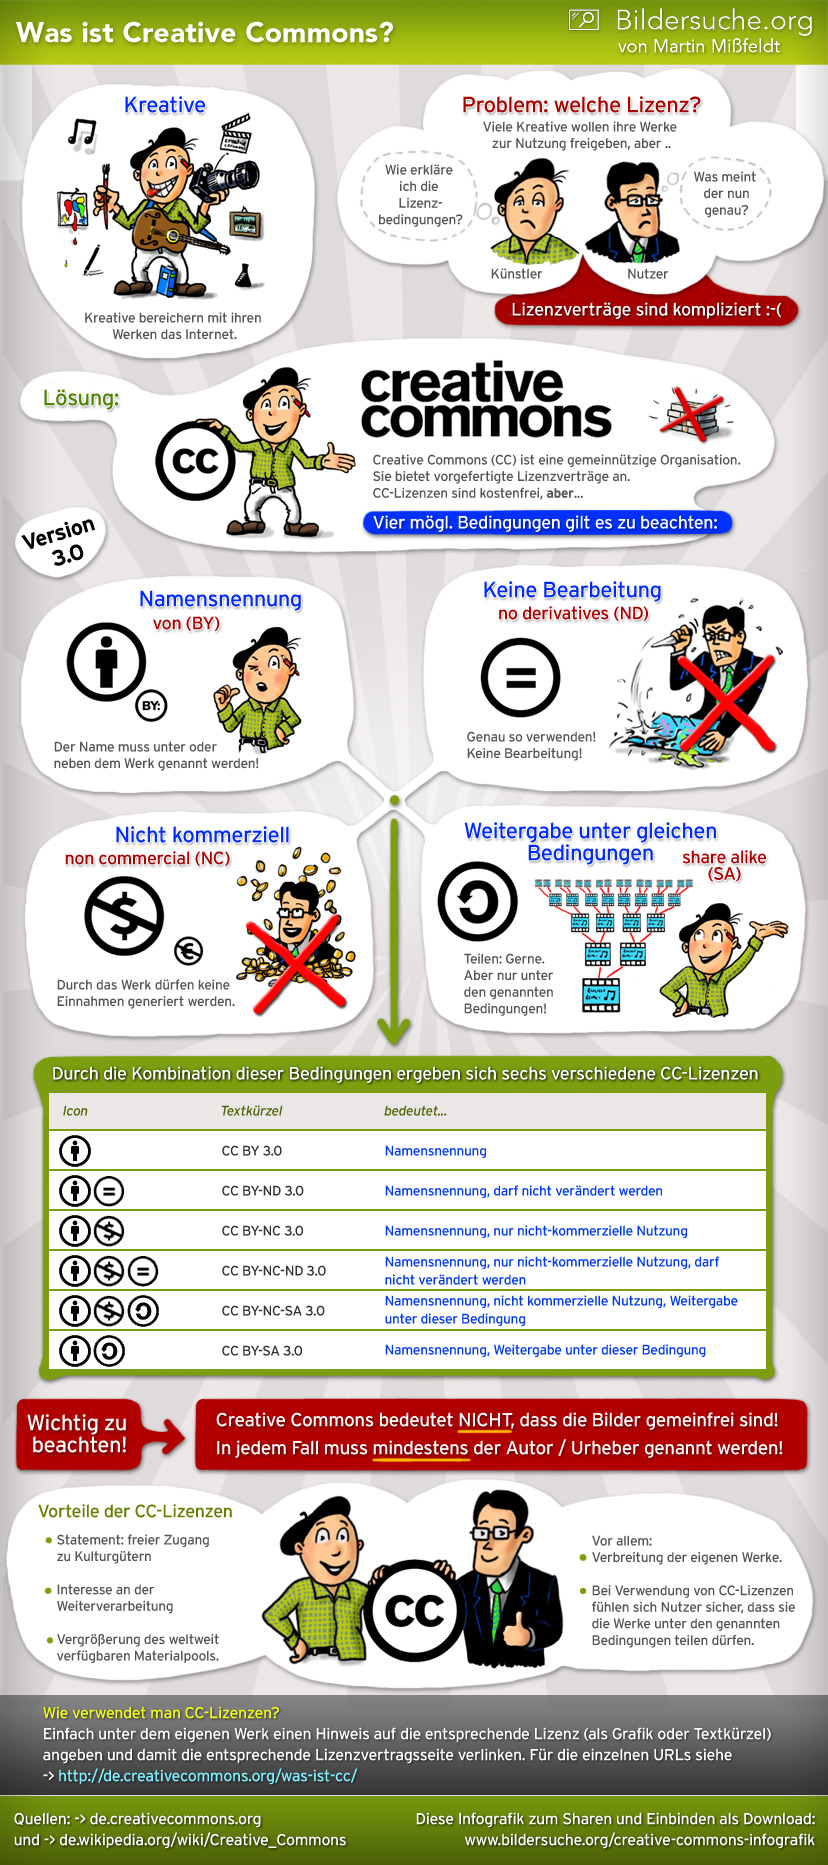 "Infografik: ""Creative Commons - Was ist und bedeutet das?"" von Martin Mißfeldt / <a href=""http://www.bildersuche.org/"">Bildersuche.org</a>, <a href=""https://creativecommons.org/licenses/by-sa/3.0/de/"">CC-BY-SA</a>"